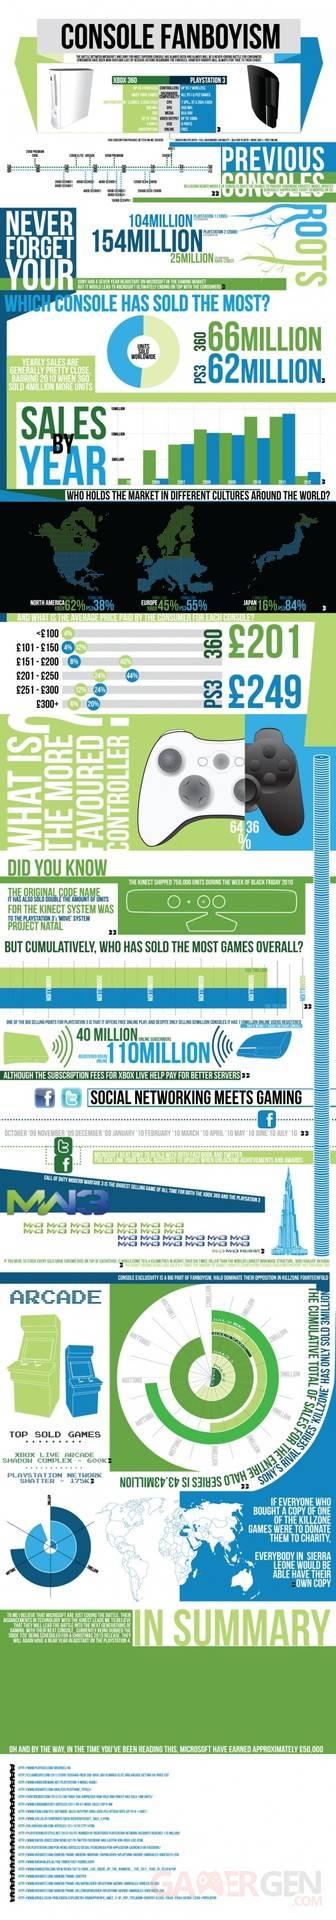 PlayStation 3 versus Xbox 360